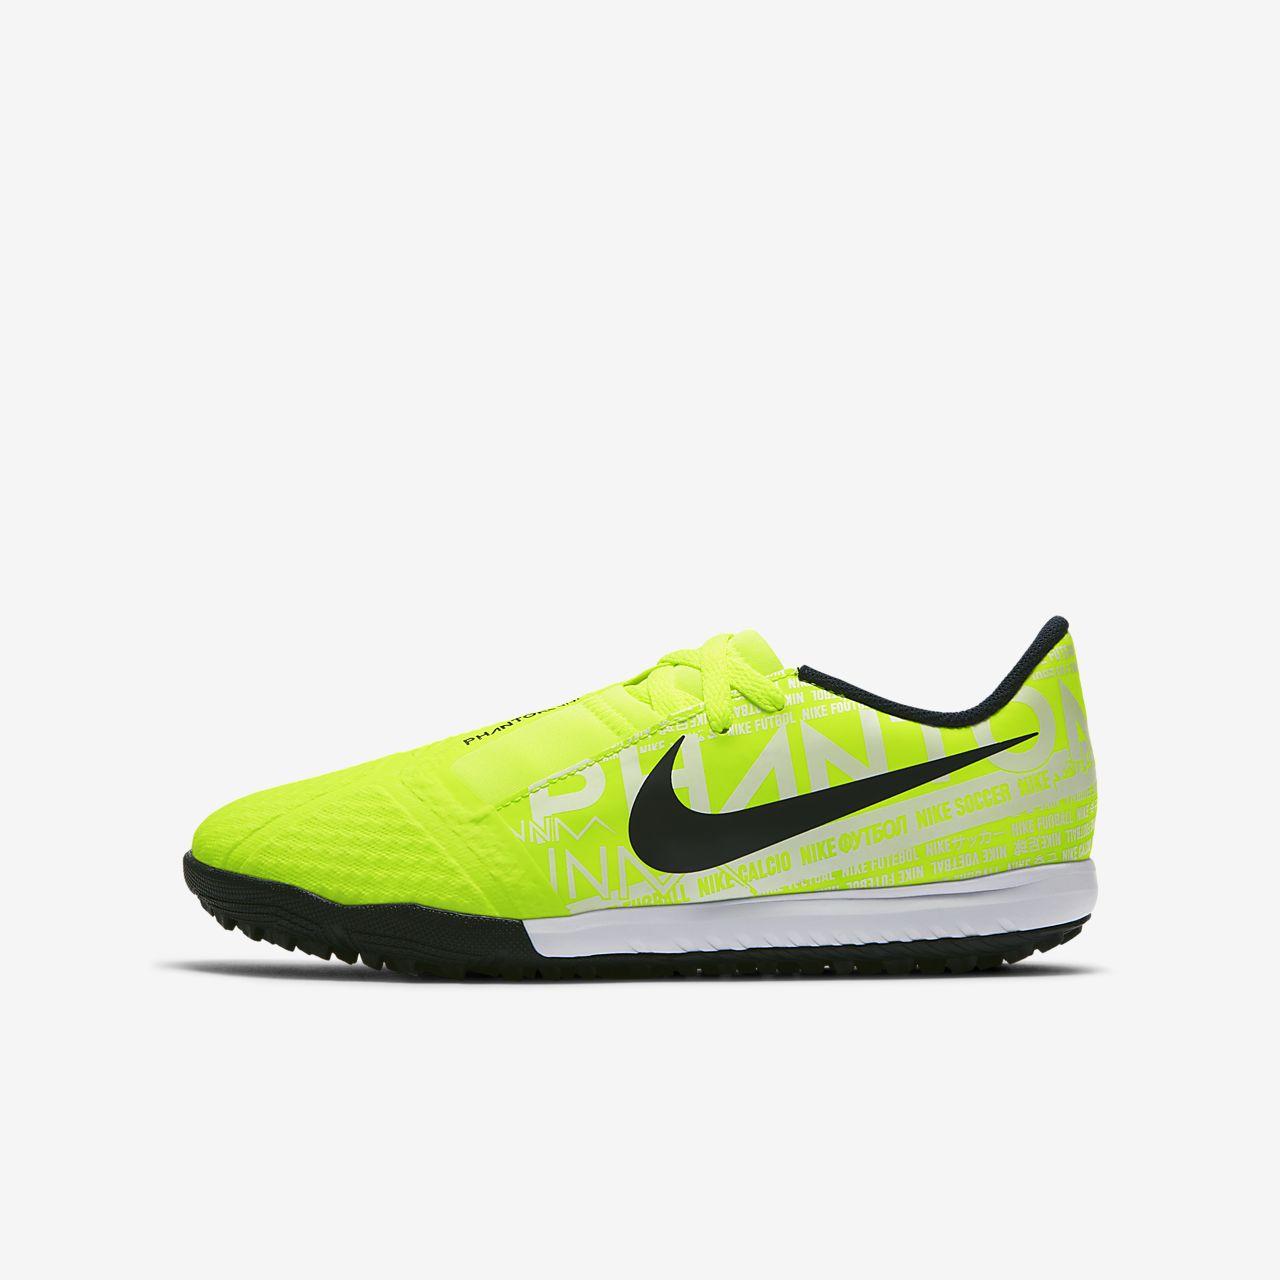 e9a71297 Nike Jr. Phantom Venom Academy TF Little/Big Kids' Turf Soccer Shoe